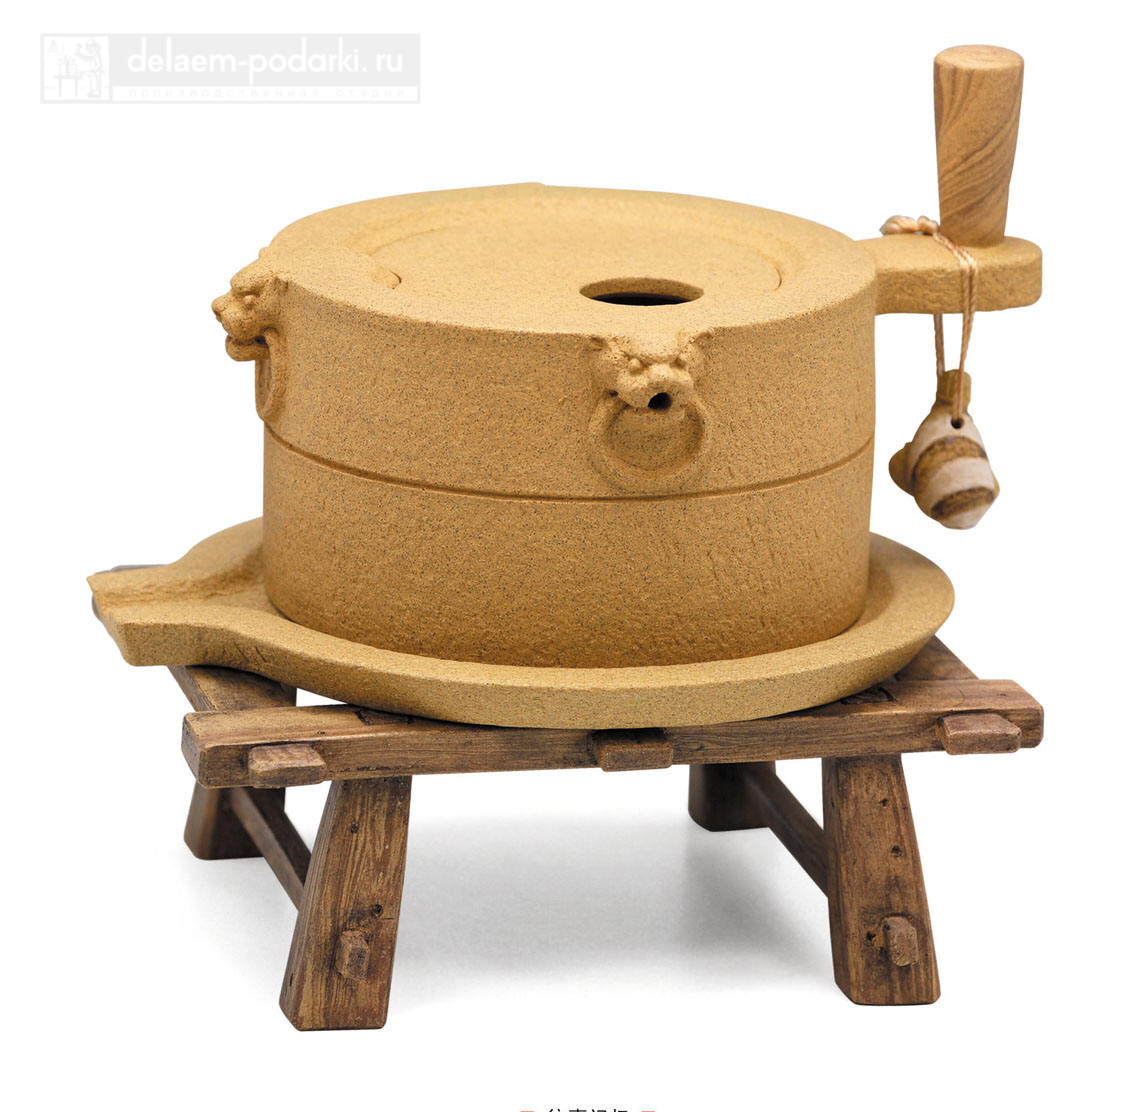 grinder_teapot_lu_wen_xia чайник на стойке